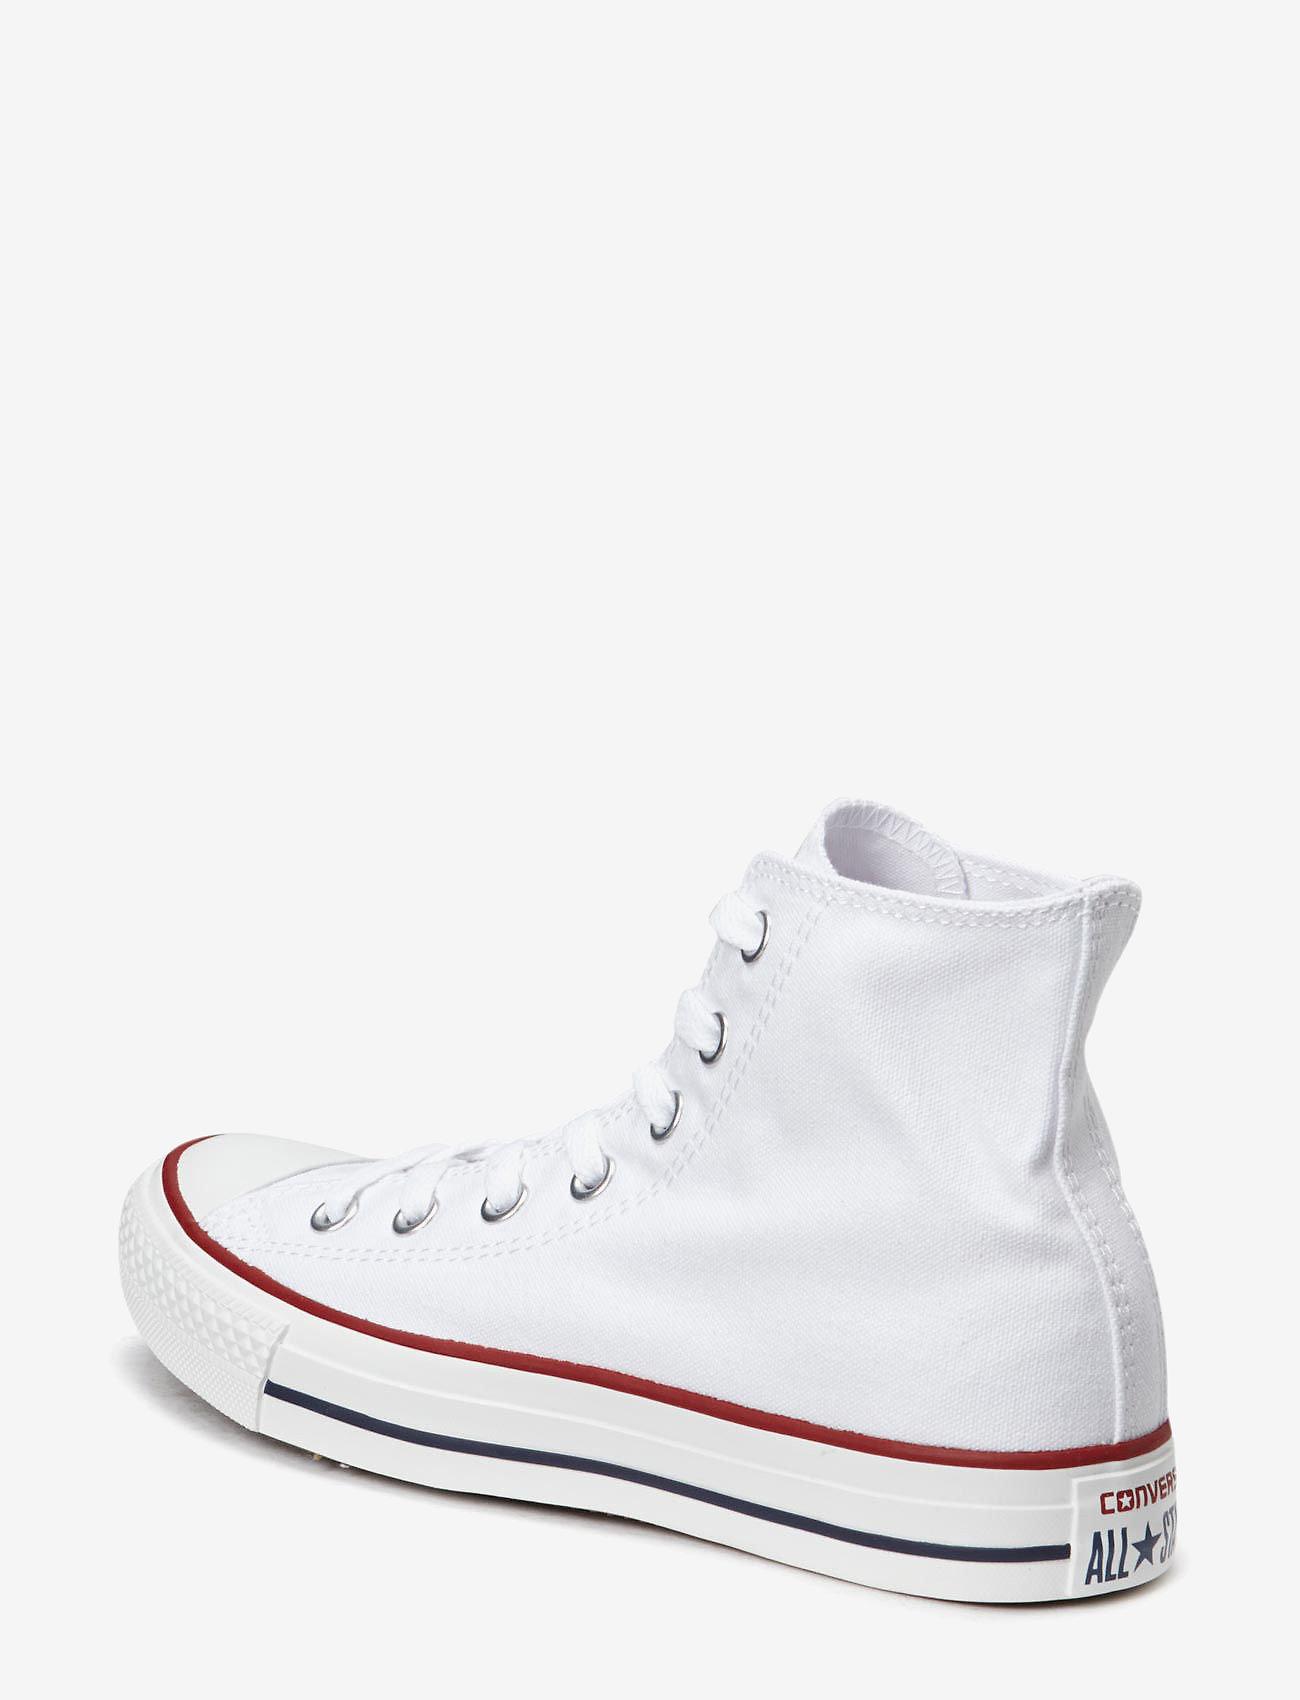 Converse - ALL STAR HI - hoog sneakers - optical white - 1